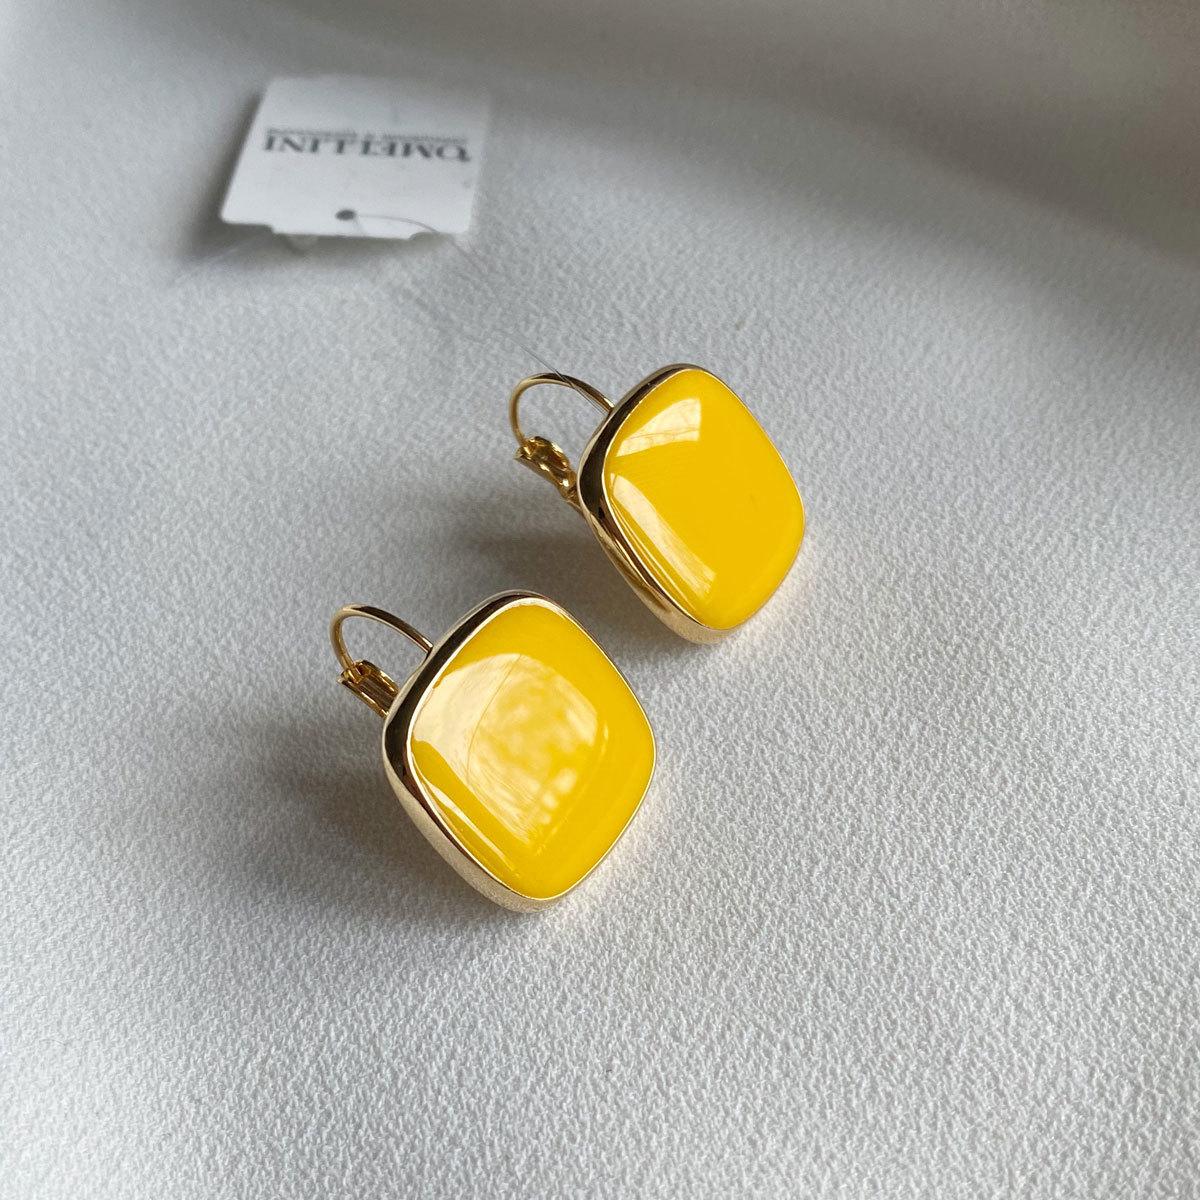 Серьги Квадраты на петлях, эмаль (желтый)